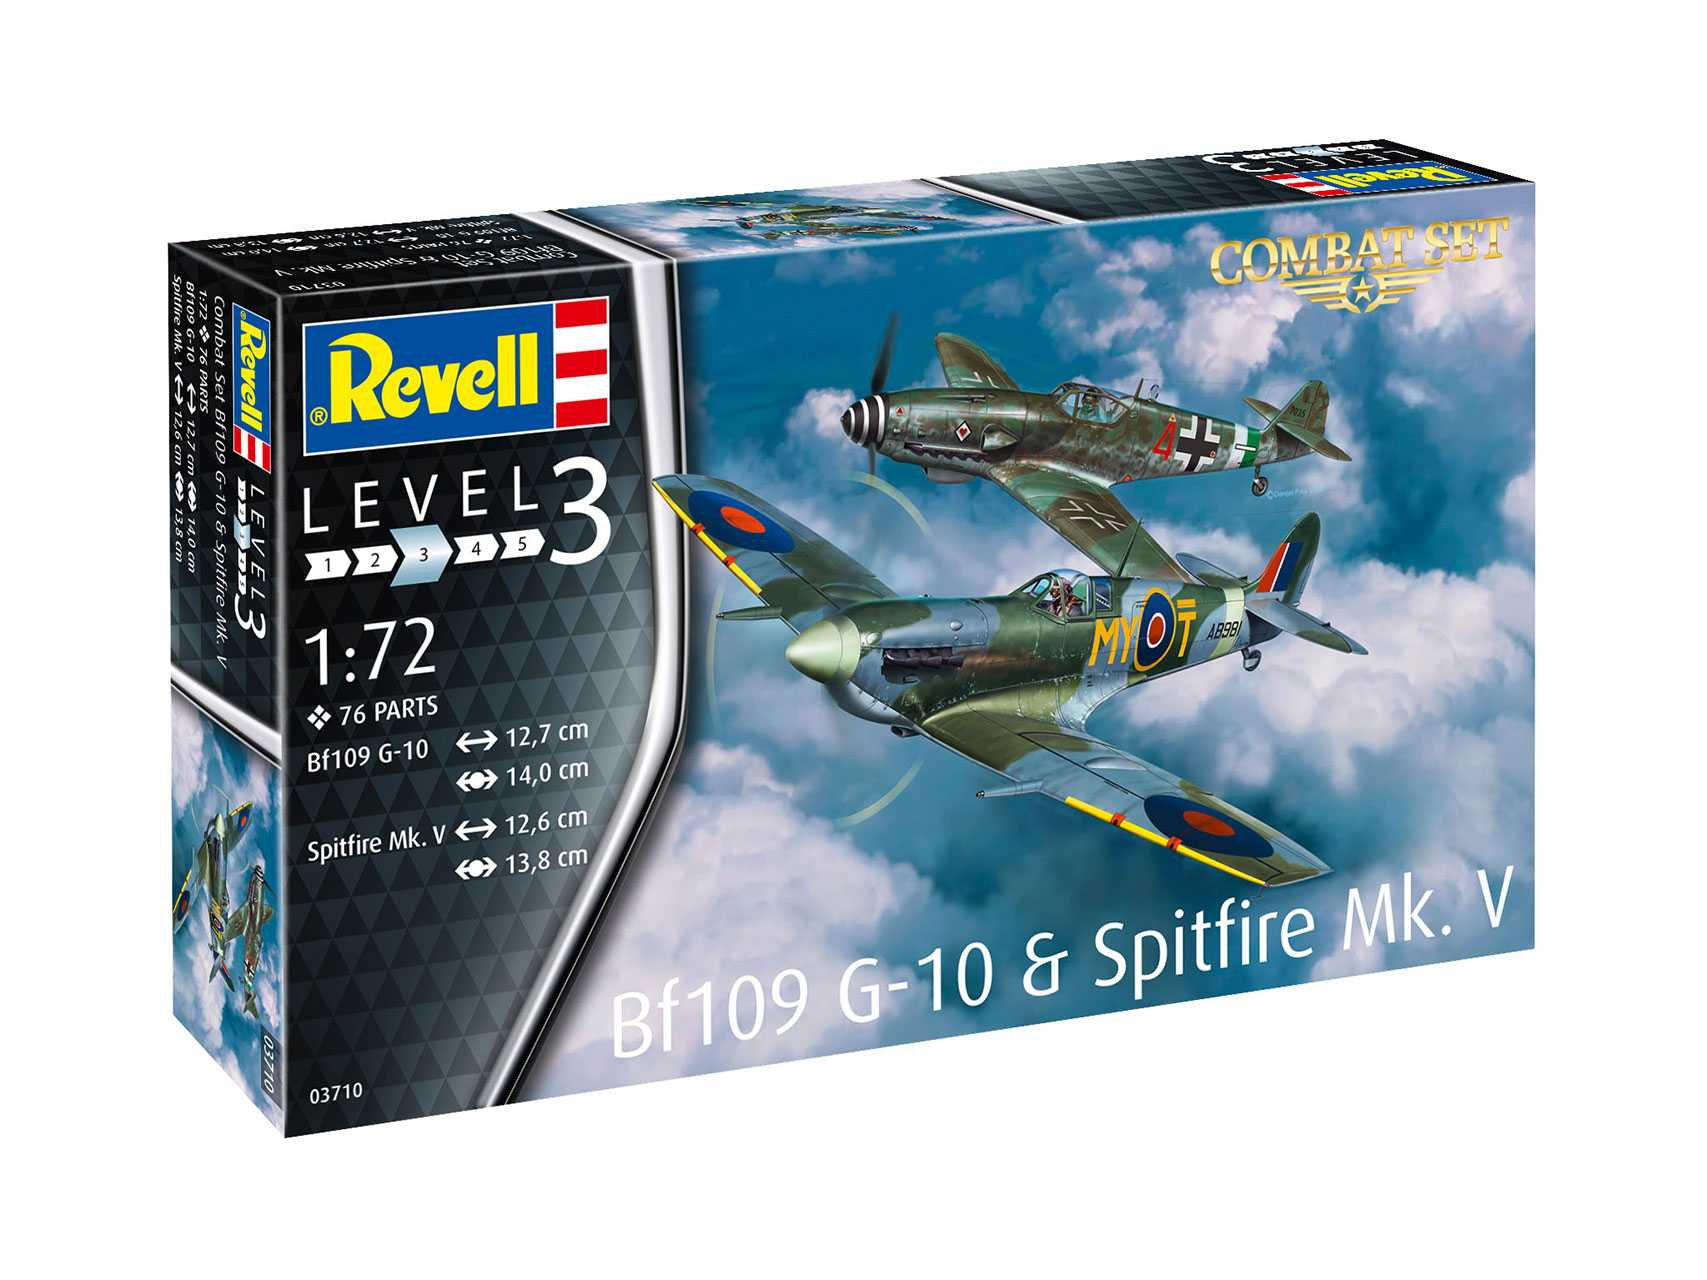 1:72 Messerschmitt Bf 109 G-10 & Supermarine Spitfire Mk.V